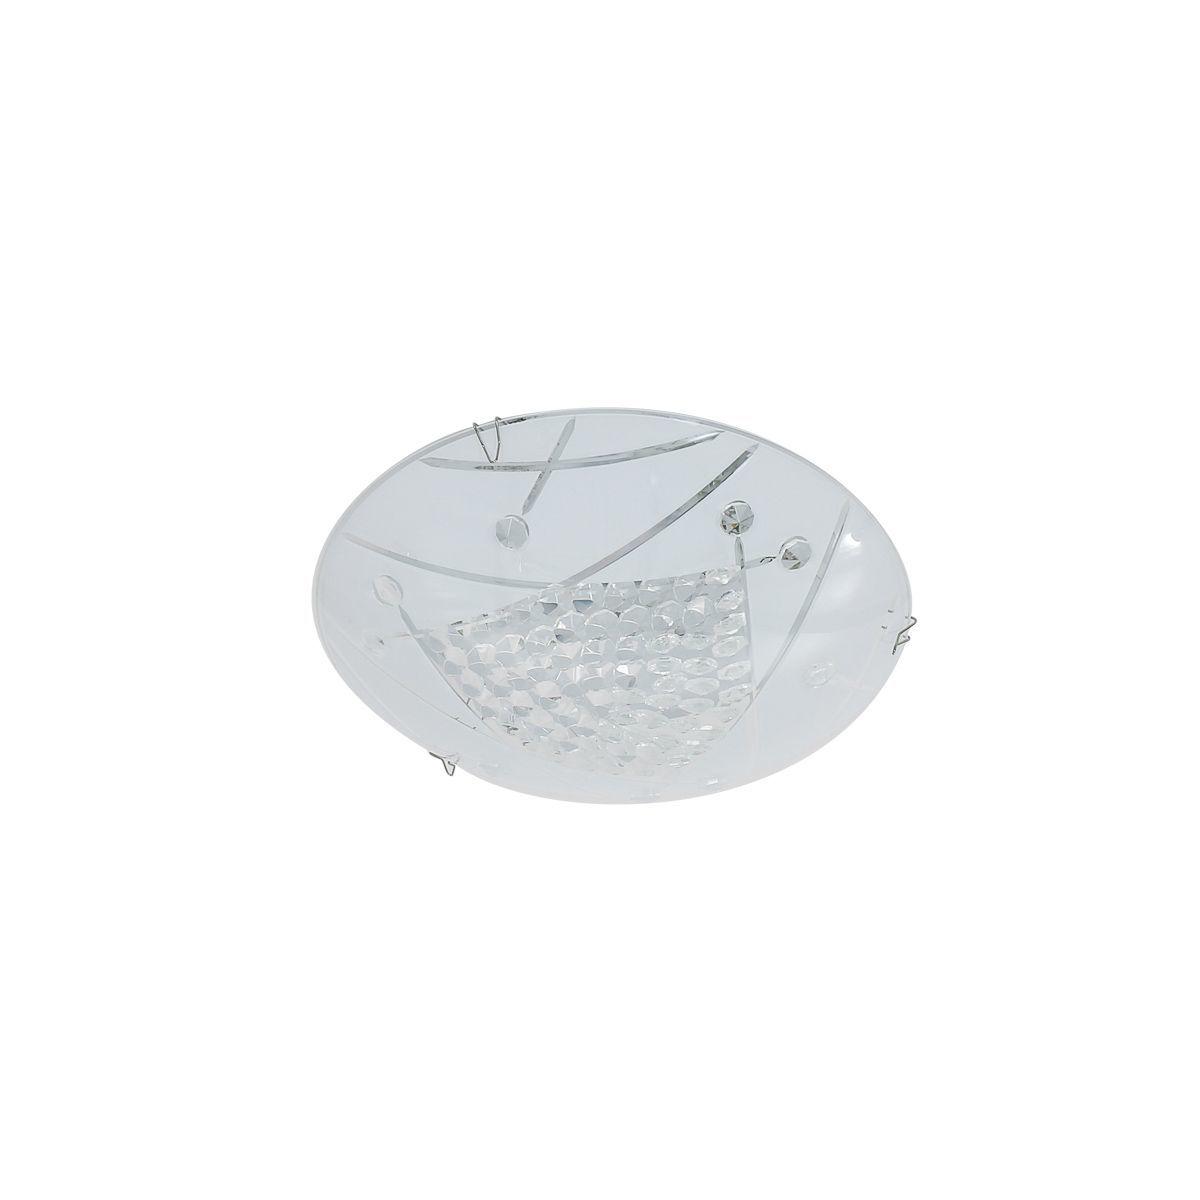 ITALUX LAMPA PLAFON LED Ditta DY47121-8W